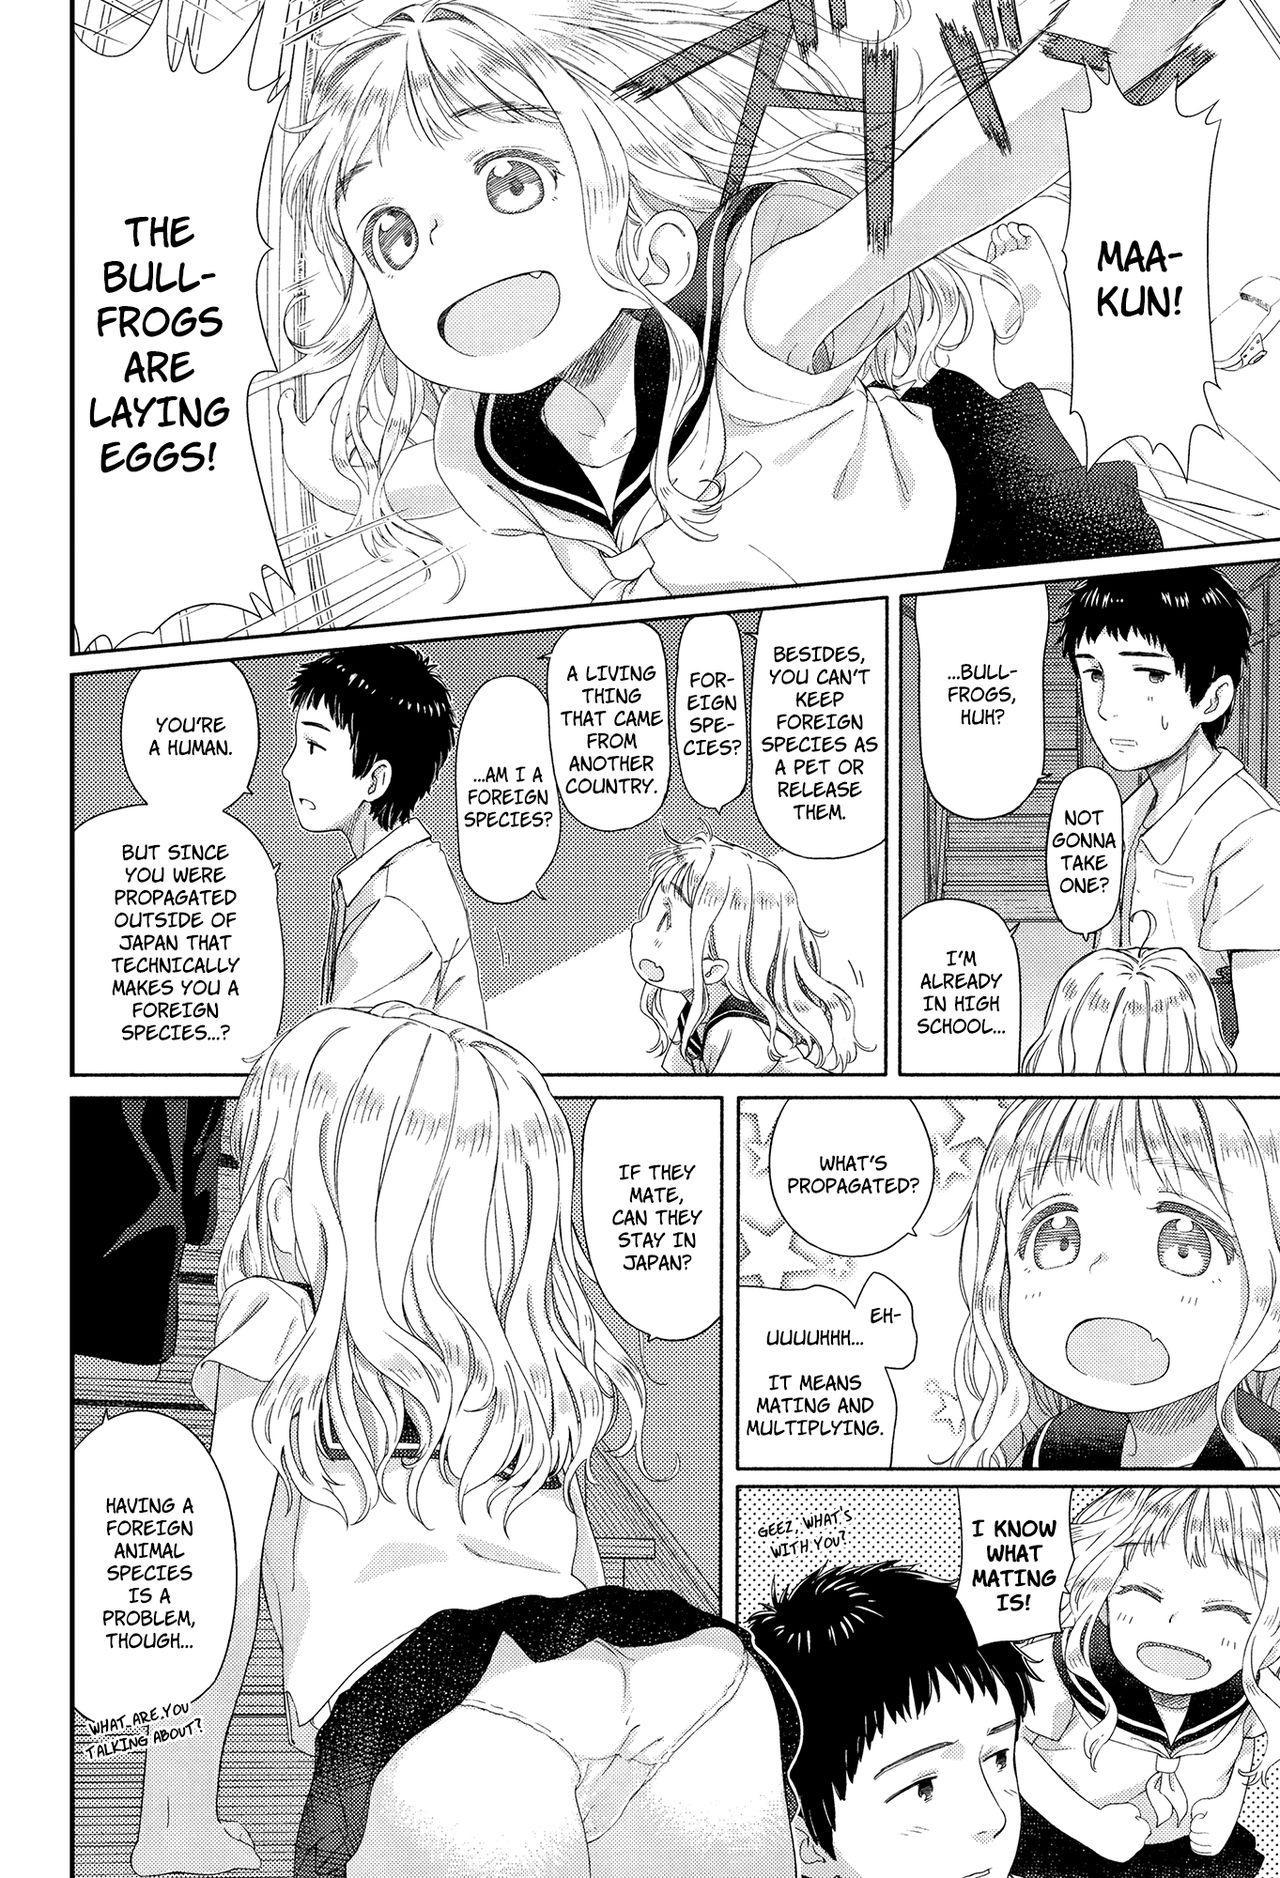 Rokujouma no Erika | Erika in the Six Tatami Room 3